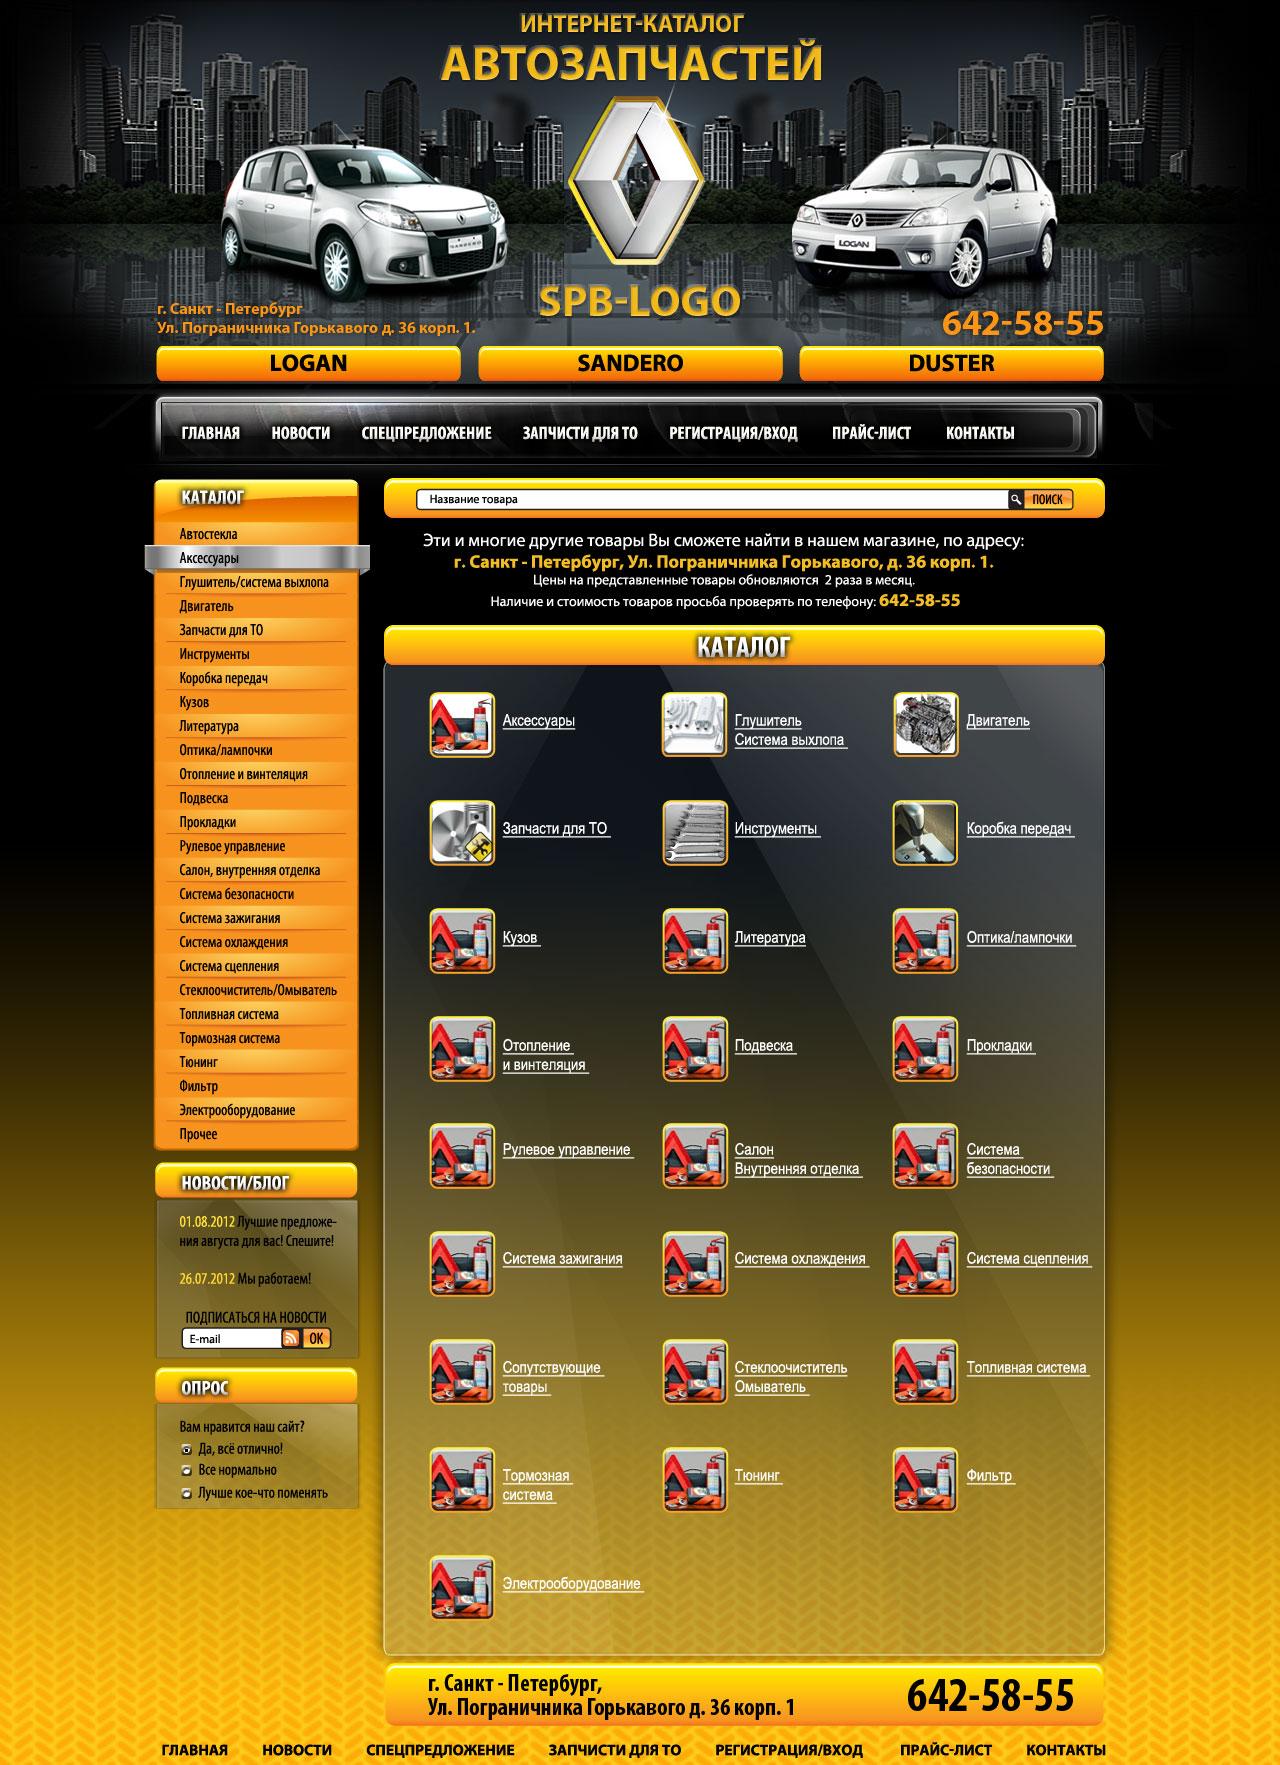 Сайт-каталог автозапчастей